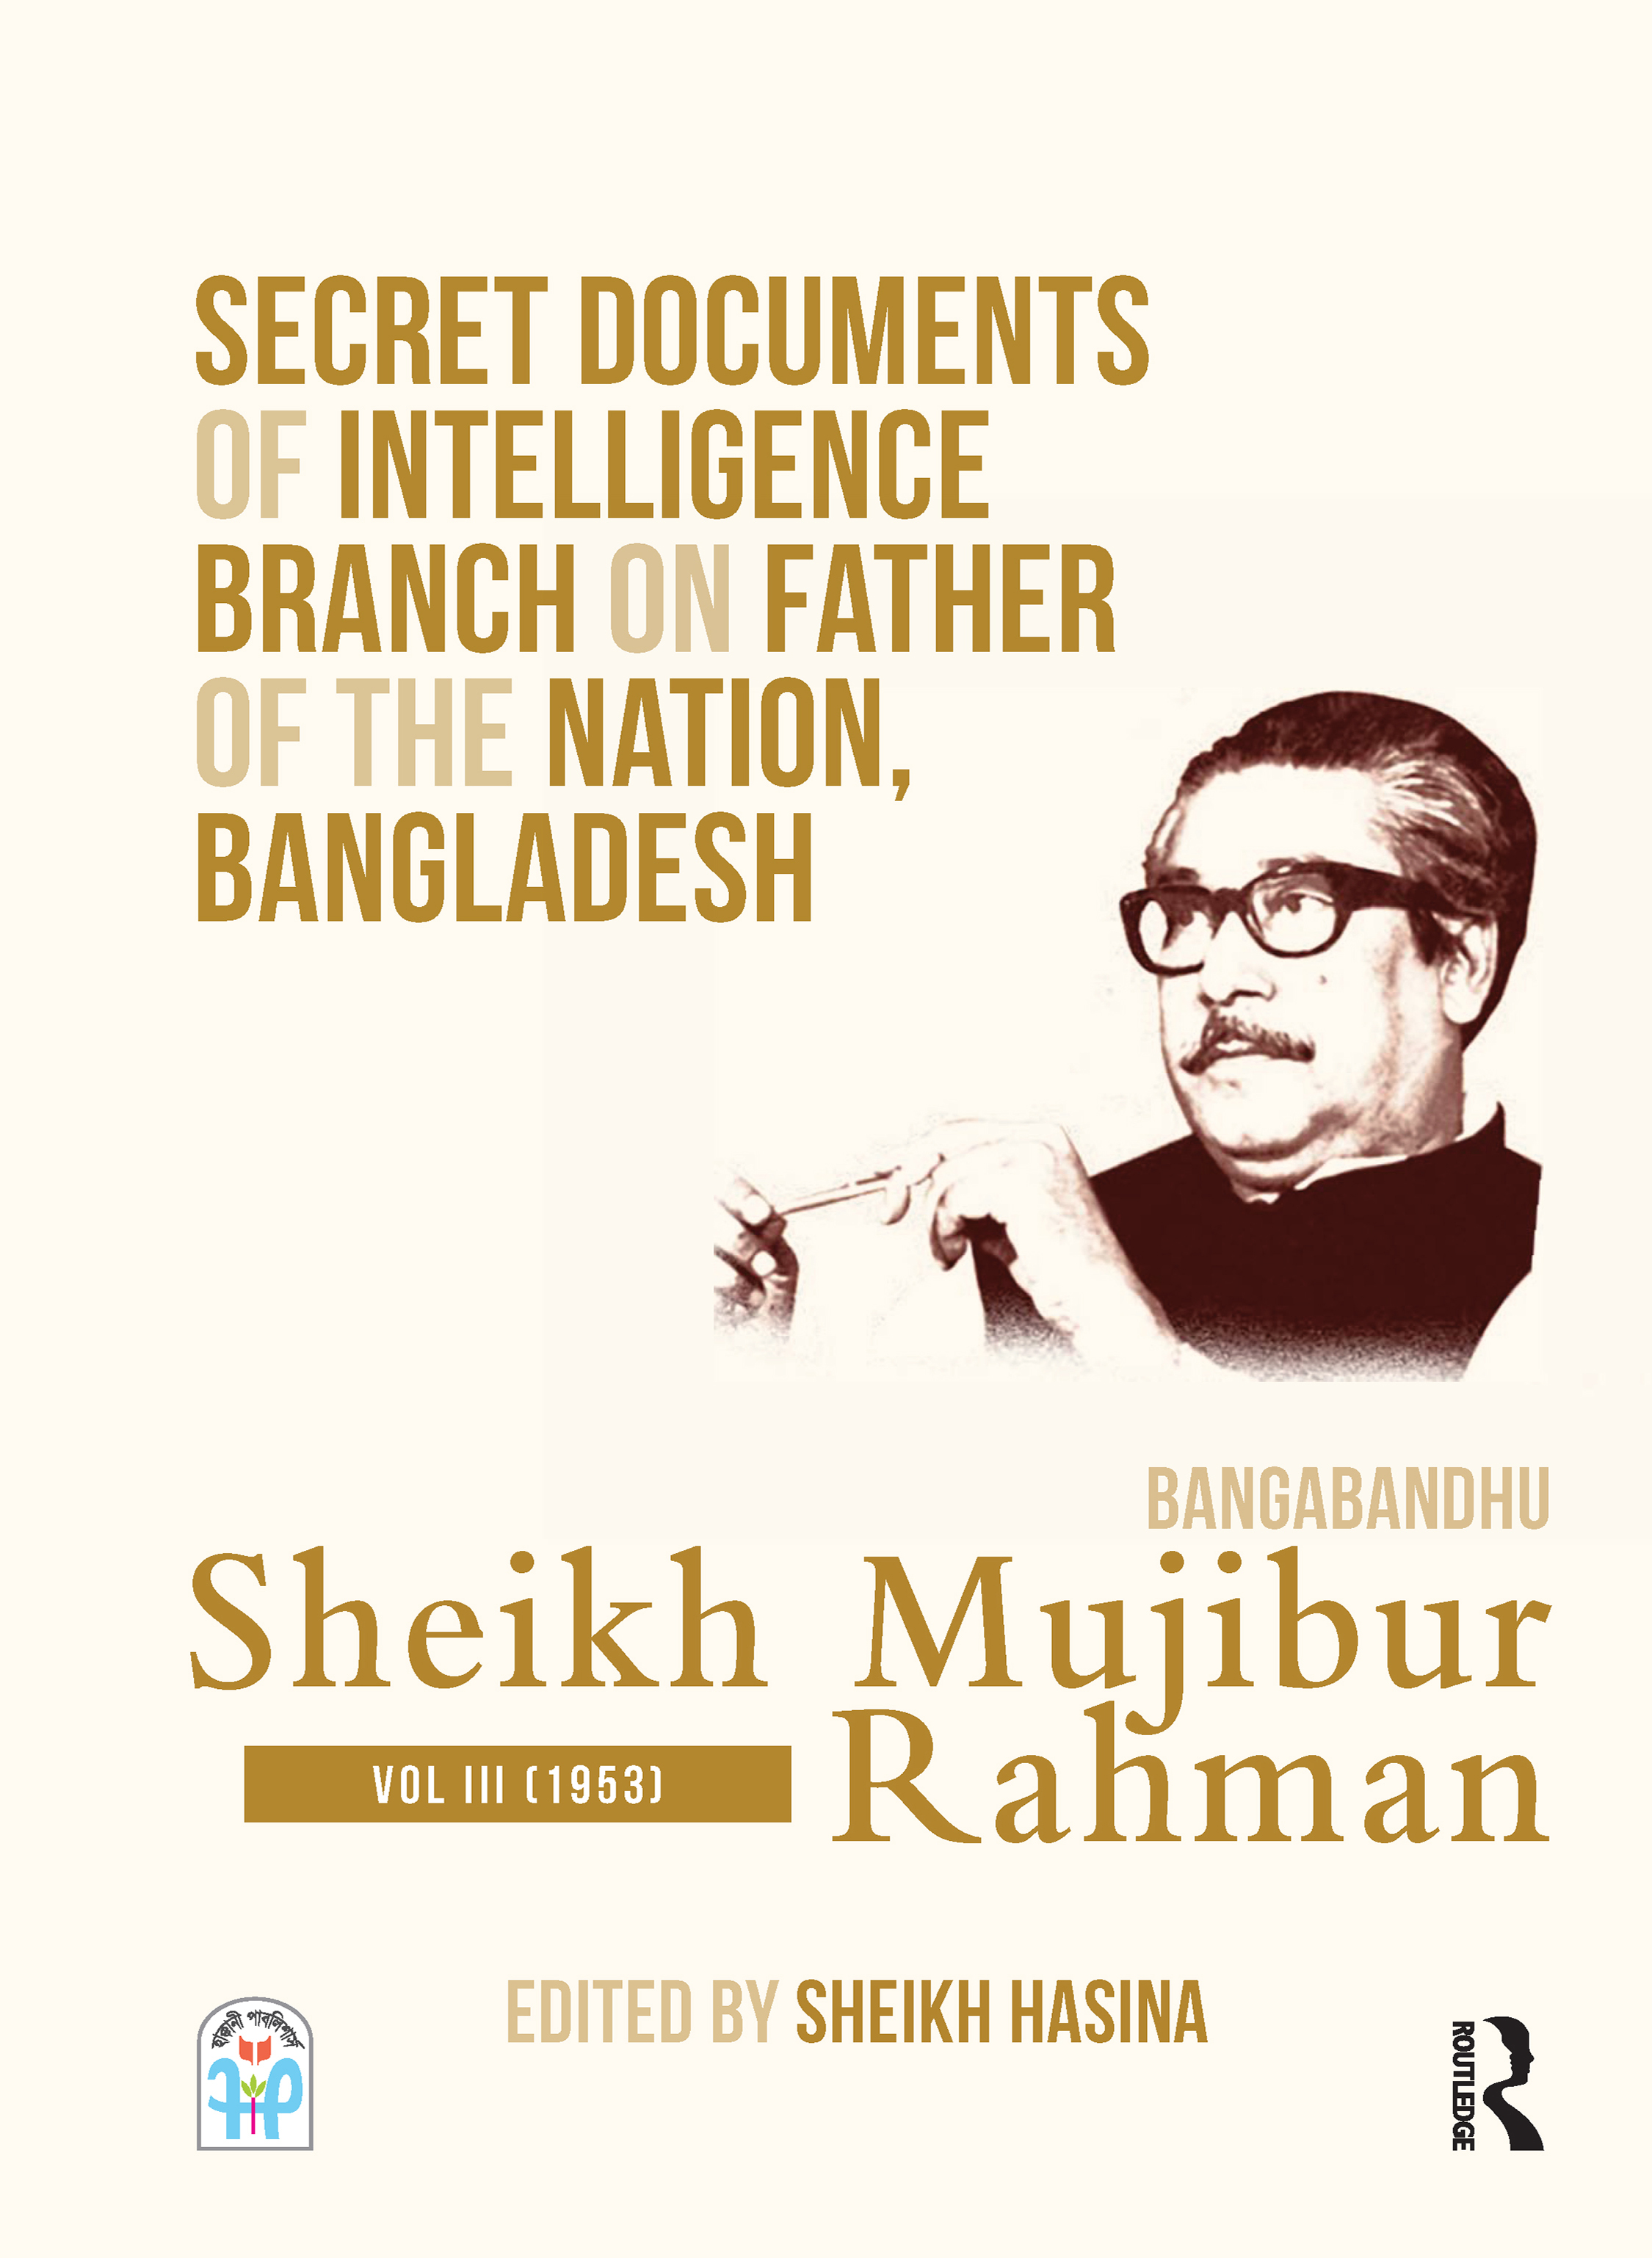 Secret Documents of Intelligence Branch on Father of The Nation, Bangladesh: Bangabandhu Sheikh Mujibur Rahman: Volume 3 (1953) book cover